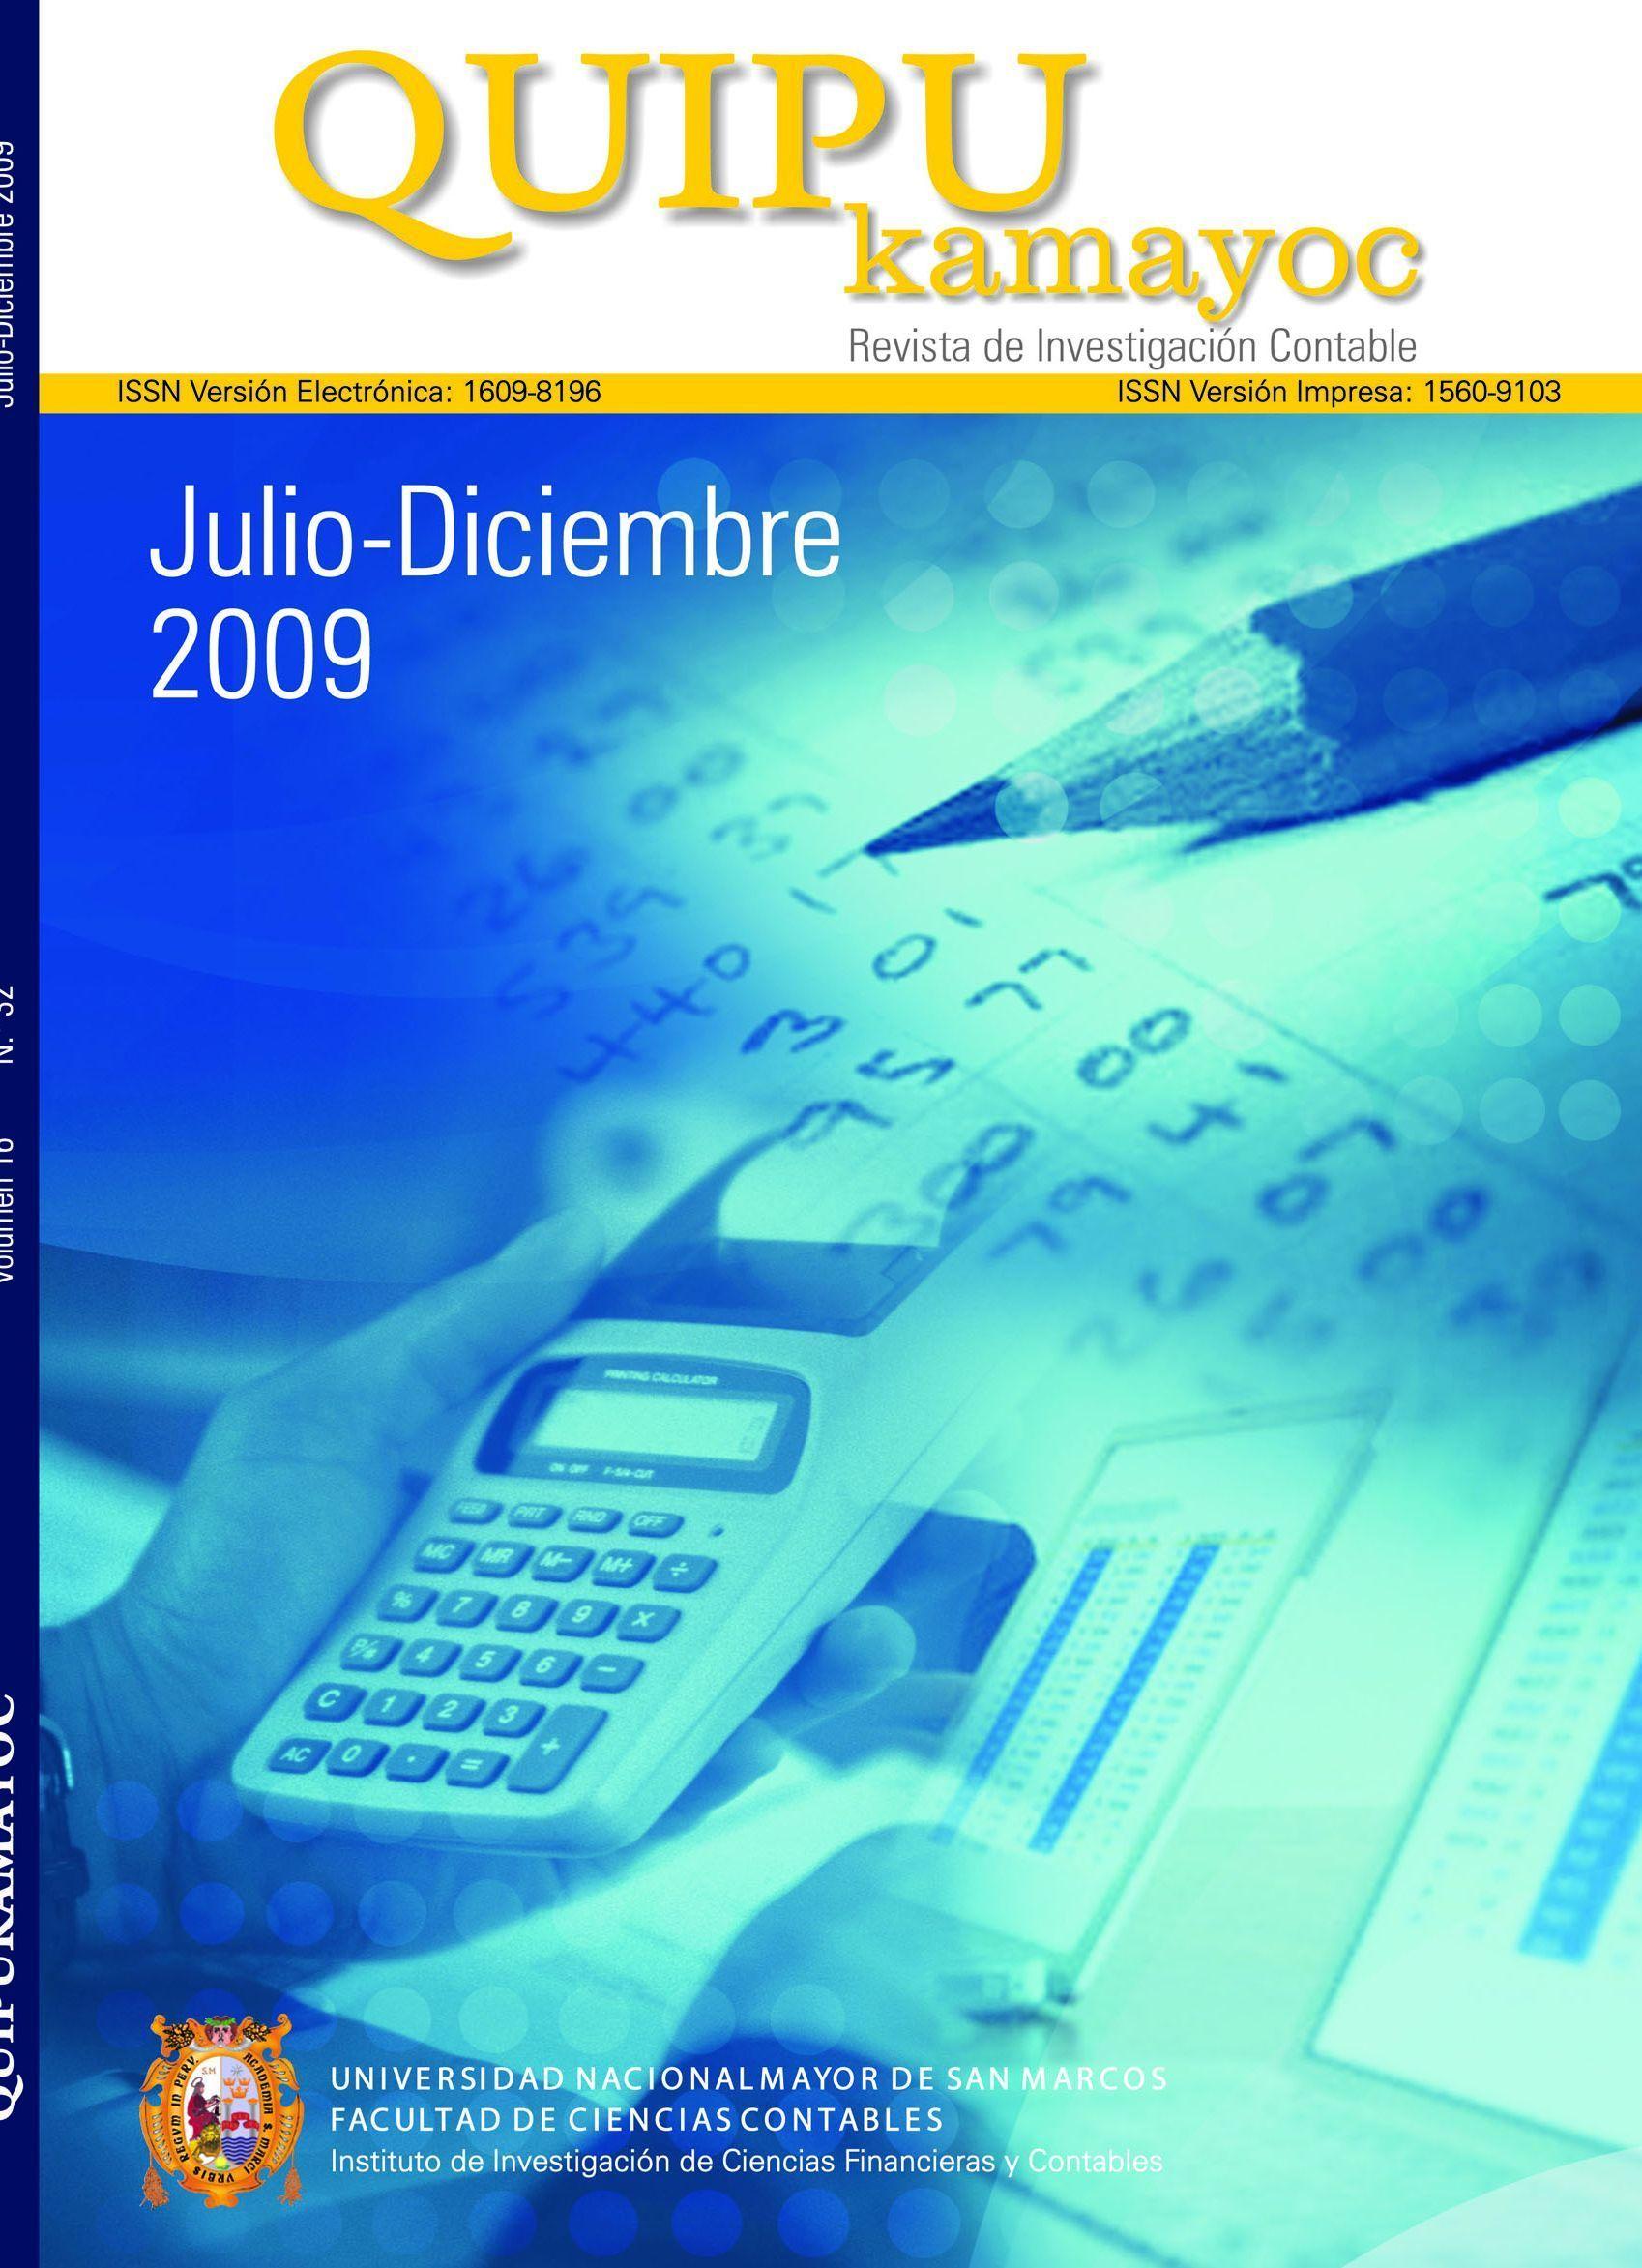 Quipukamayoc 2009-II